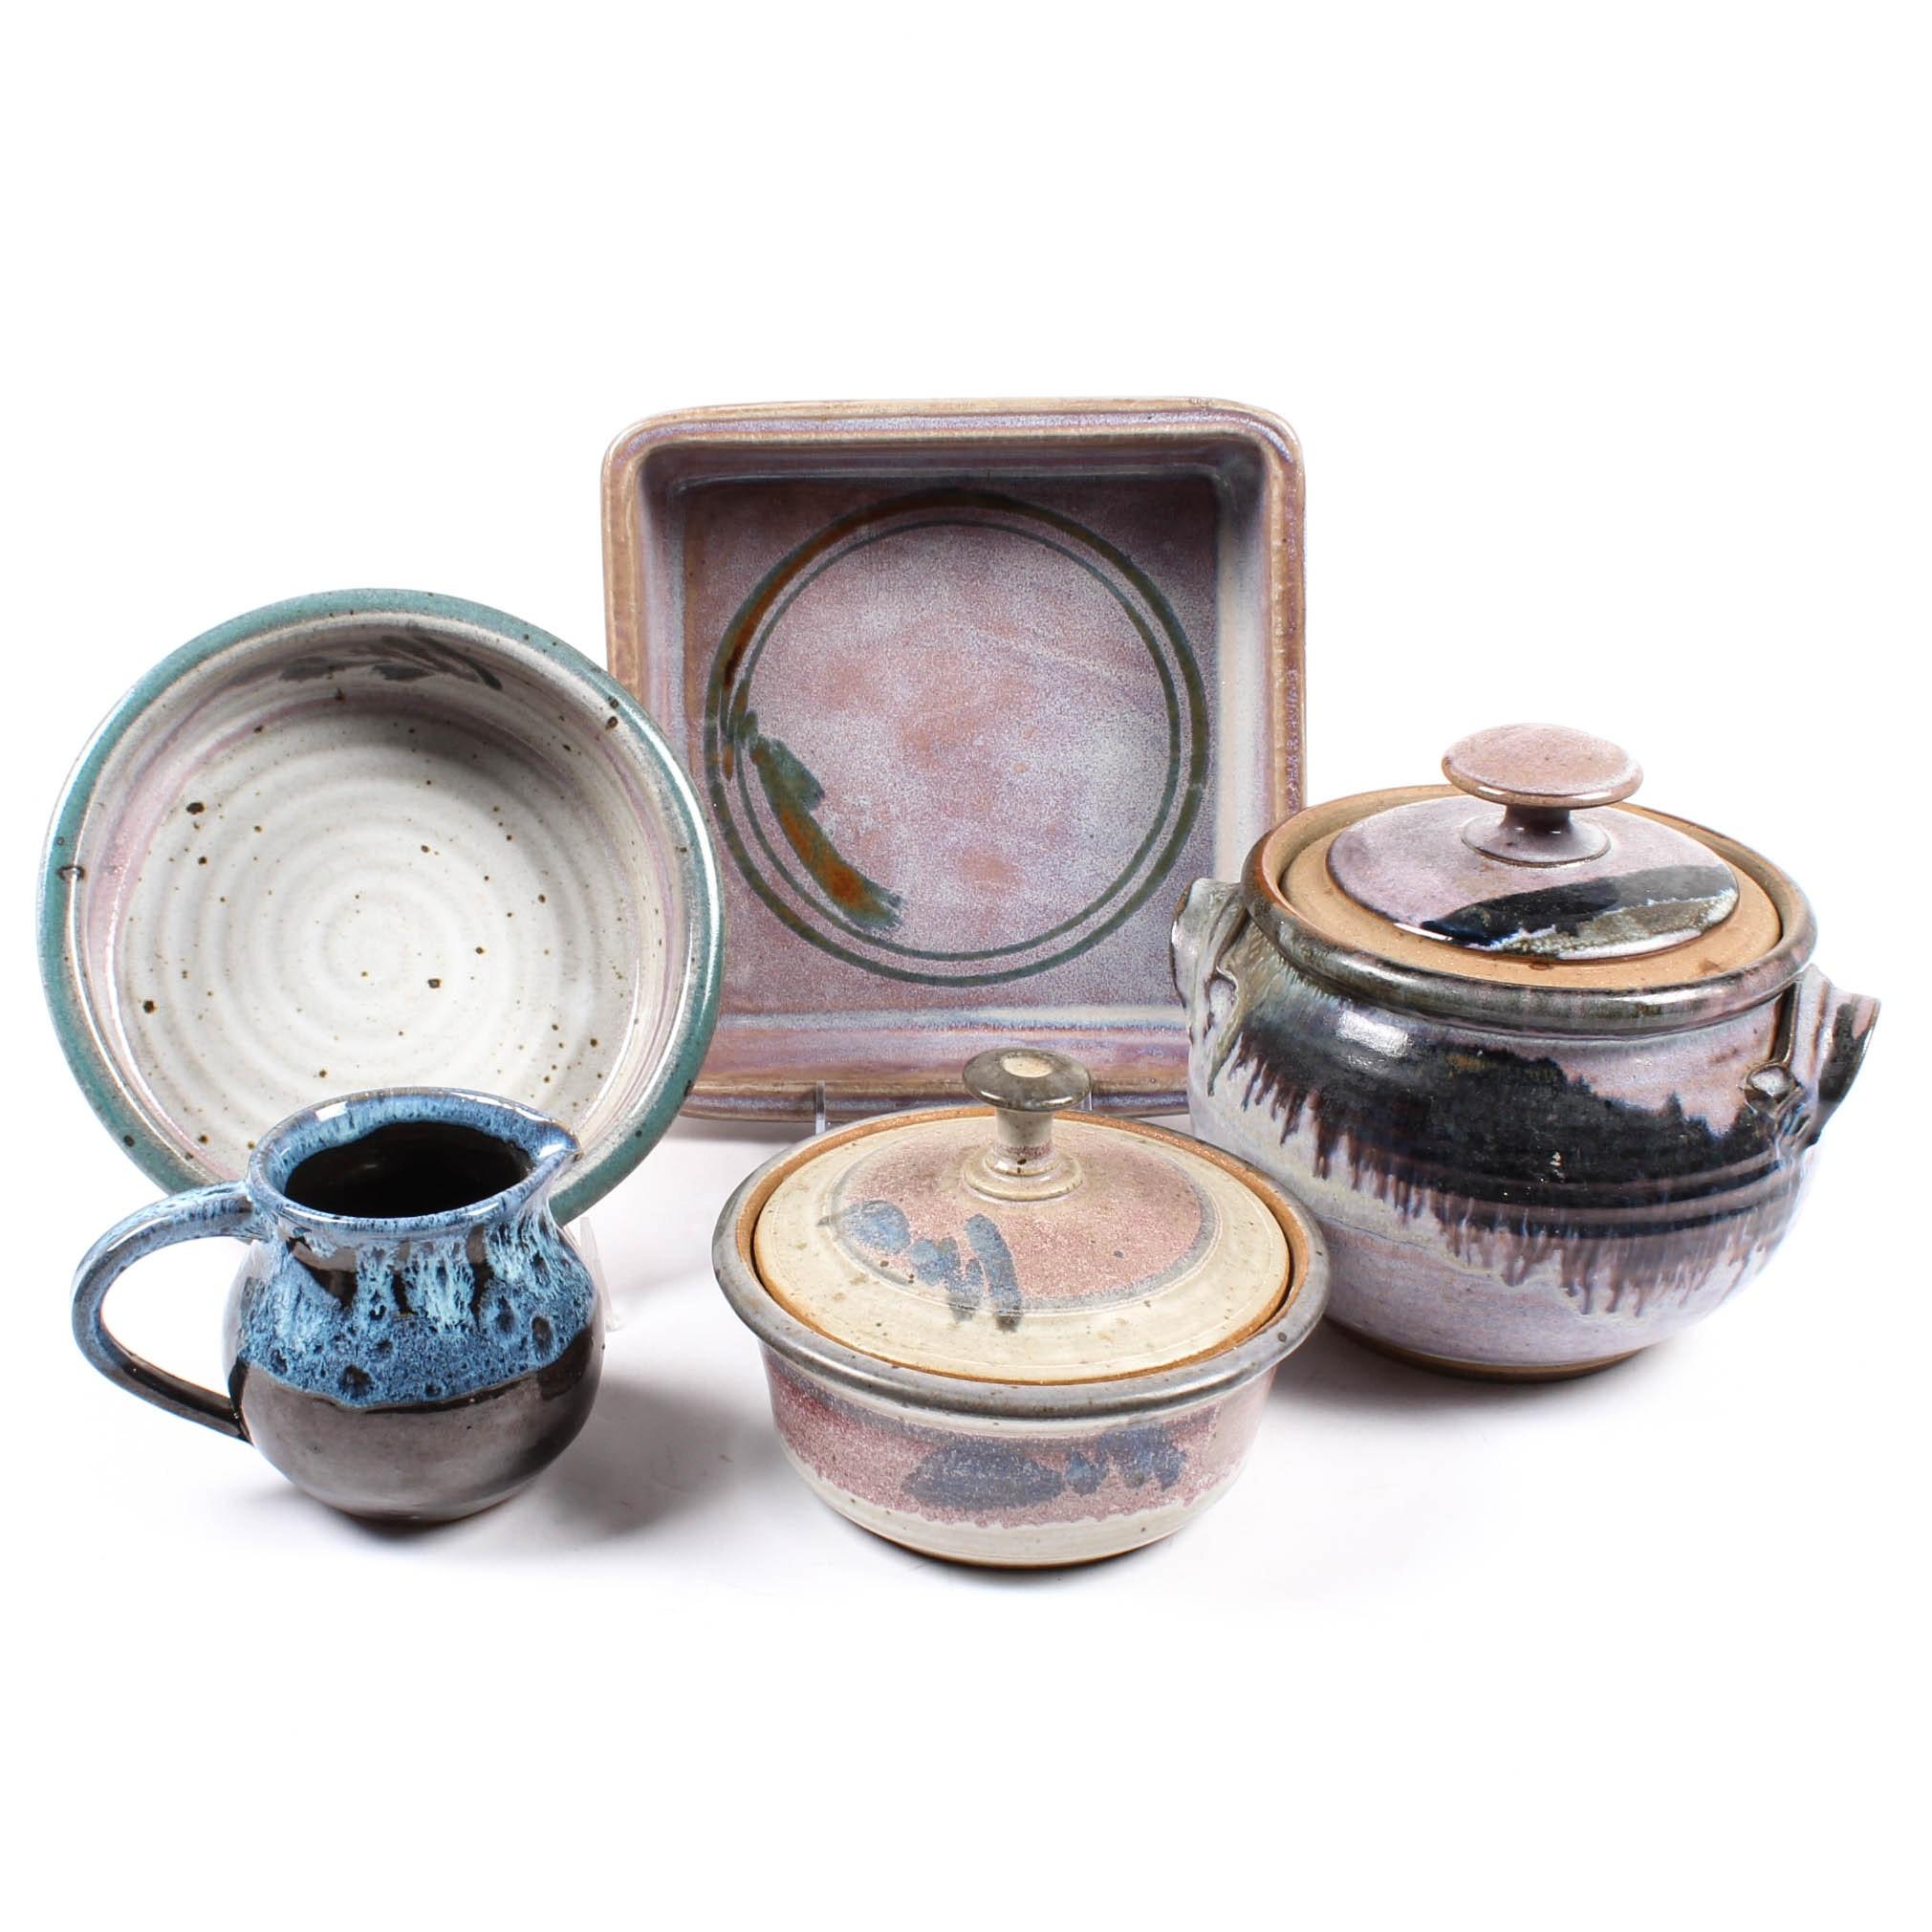 Vintage Artisan Pottery Bakeware